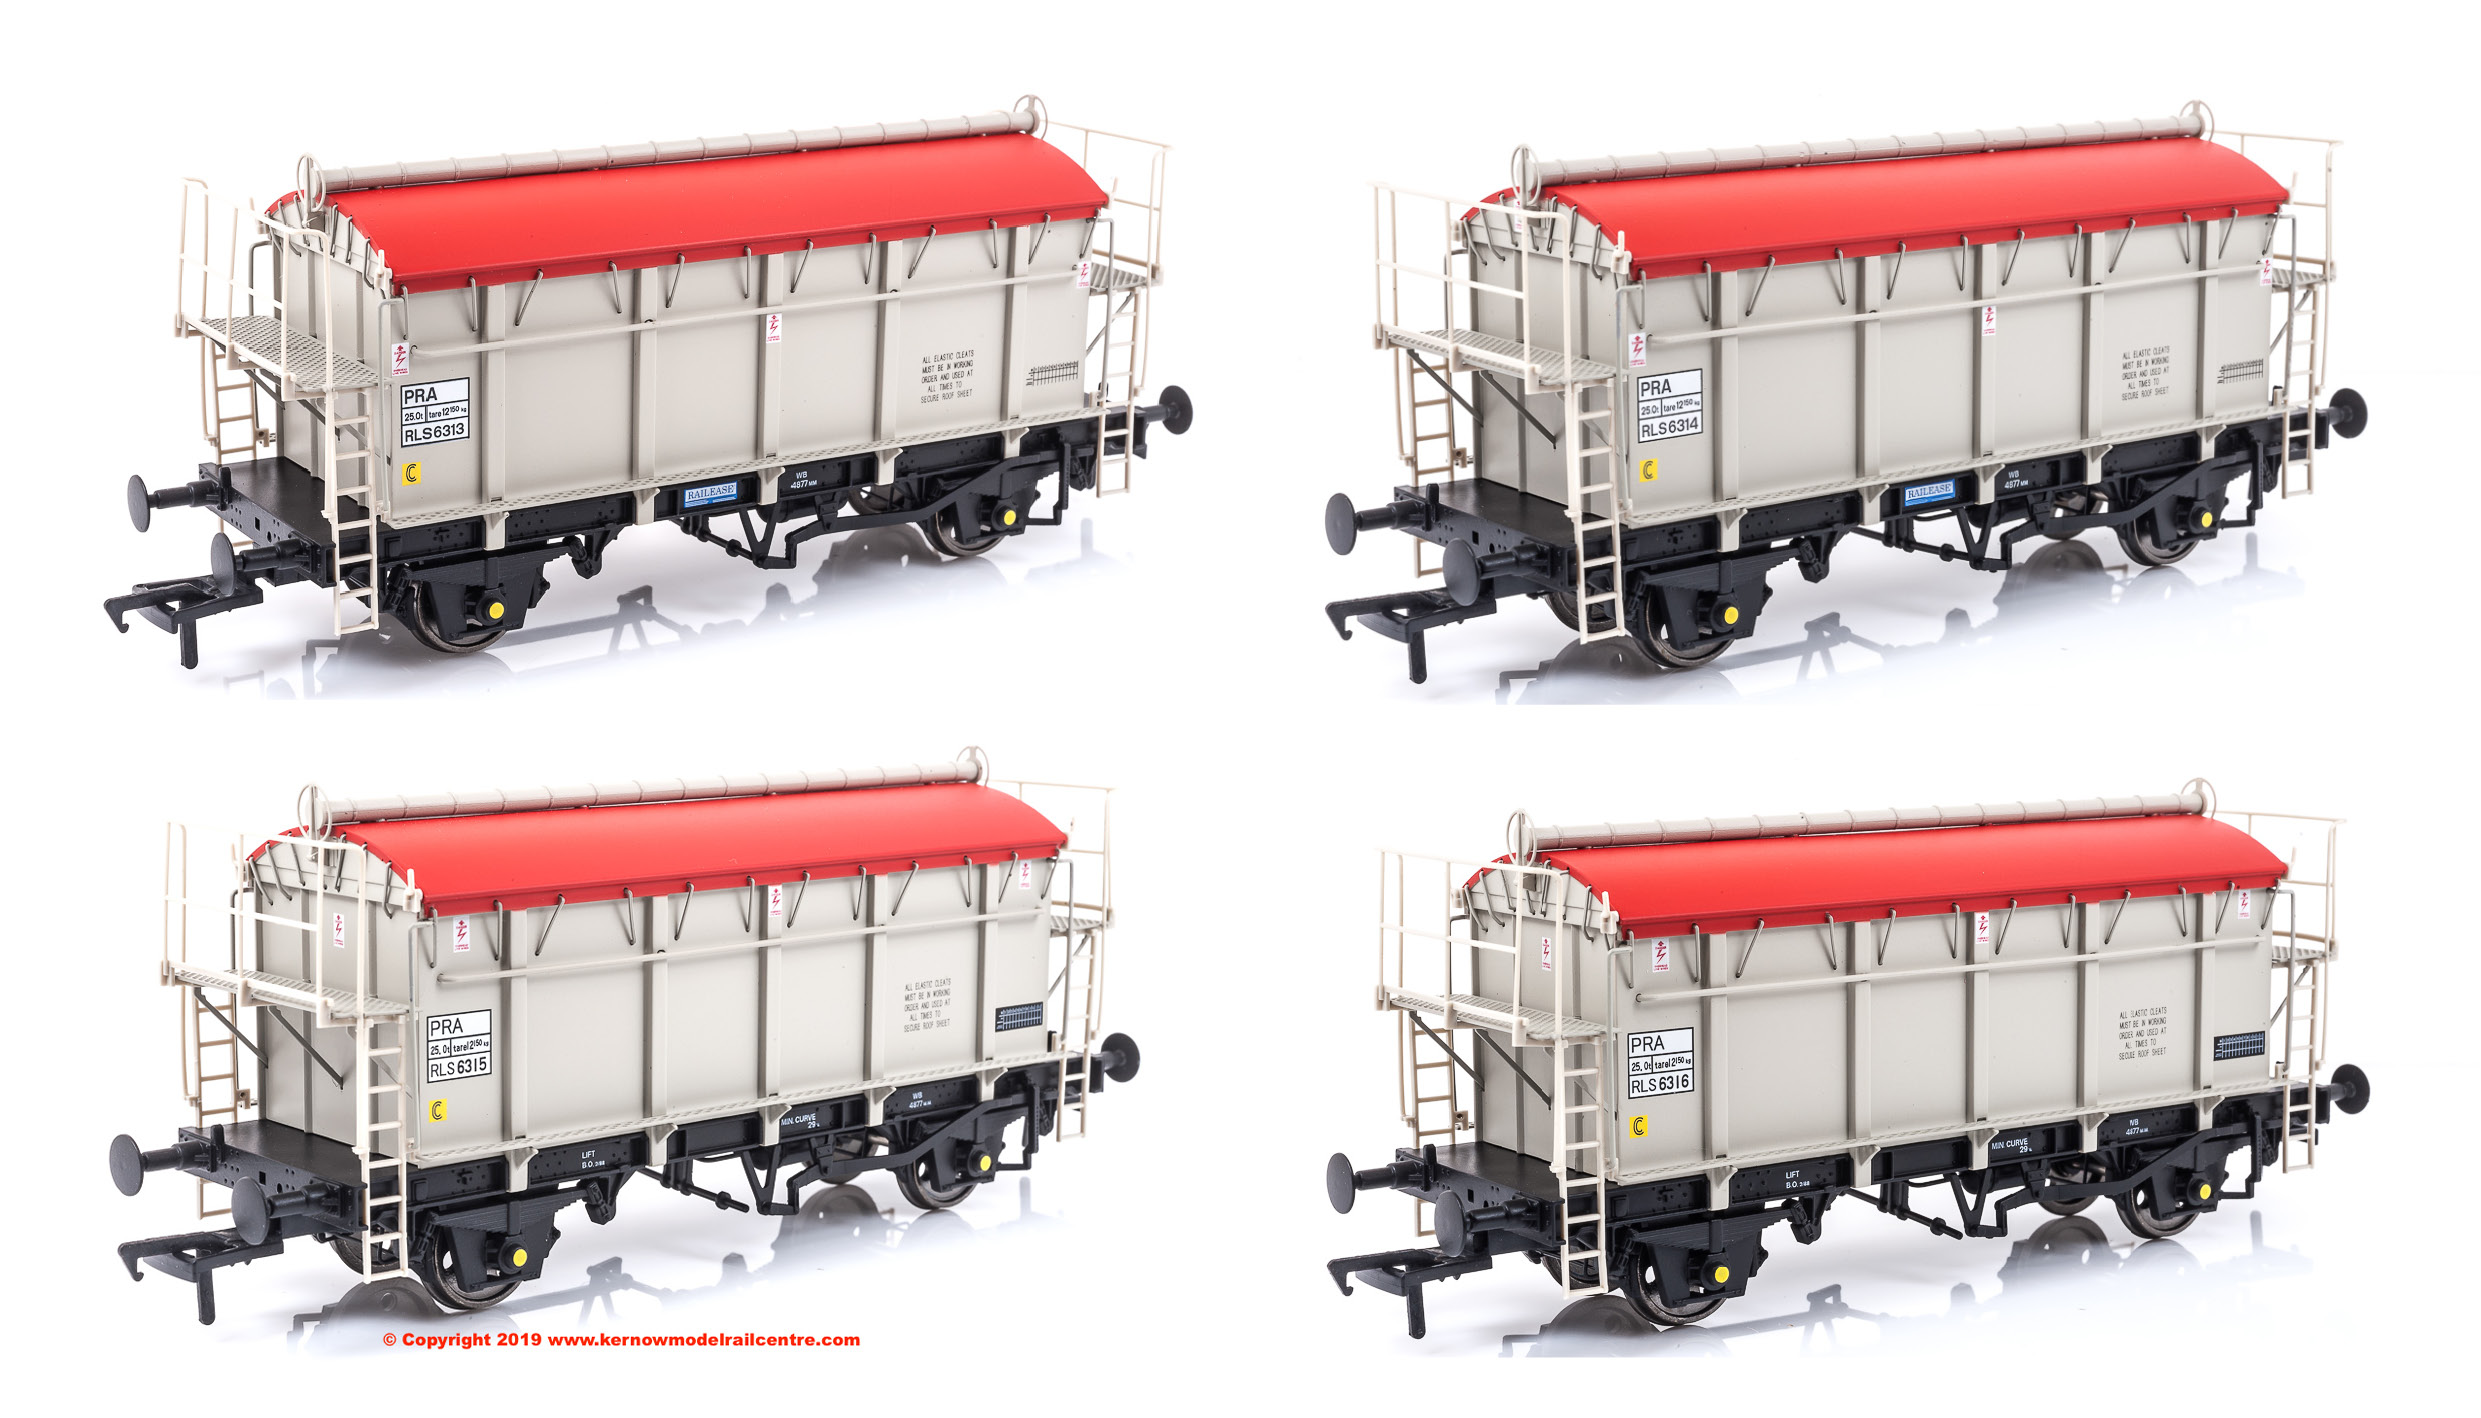 SB007ZA PRA Wagon Image